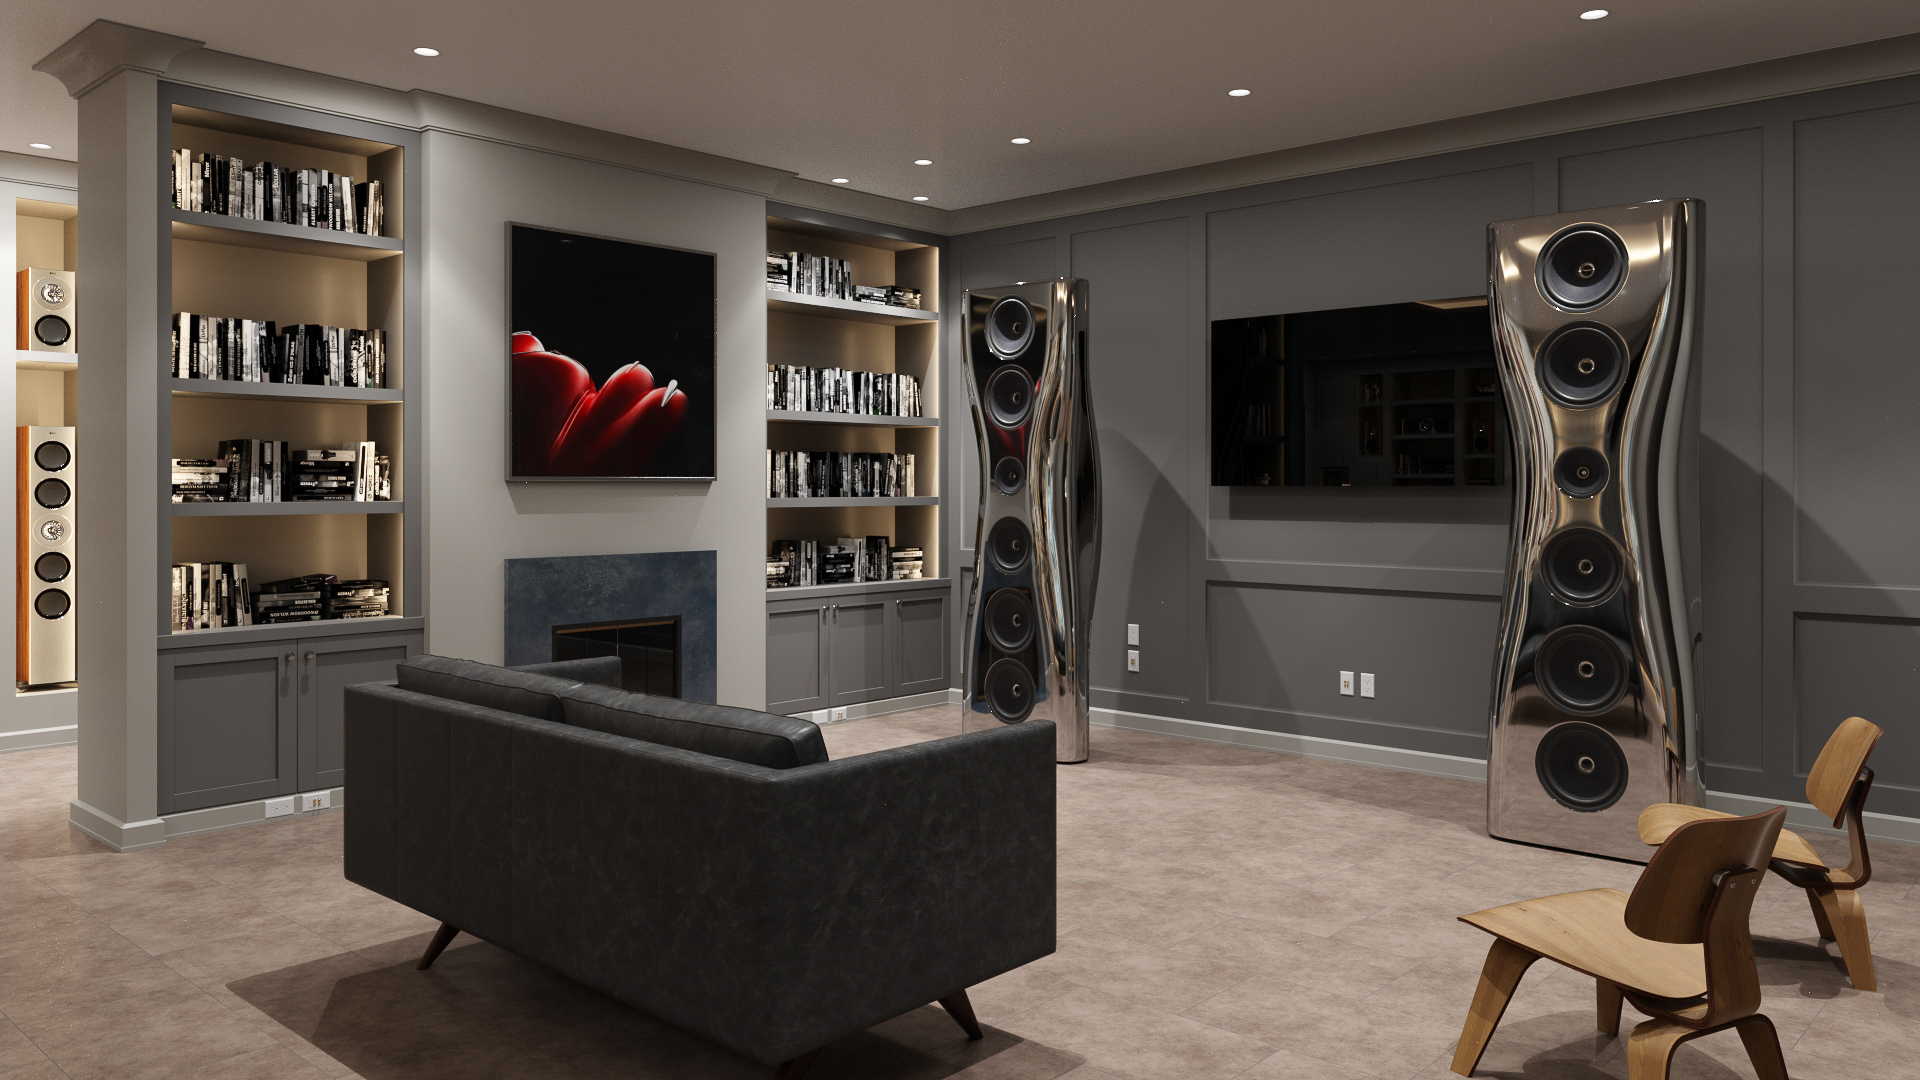 19044205-KEF Virtual Music Lounge_Interior Still_Final_Living Room-1